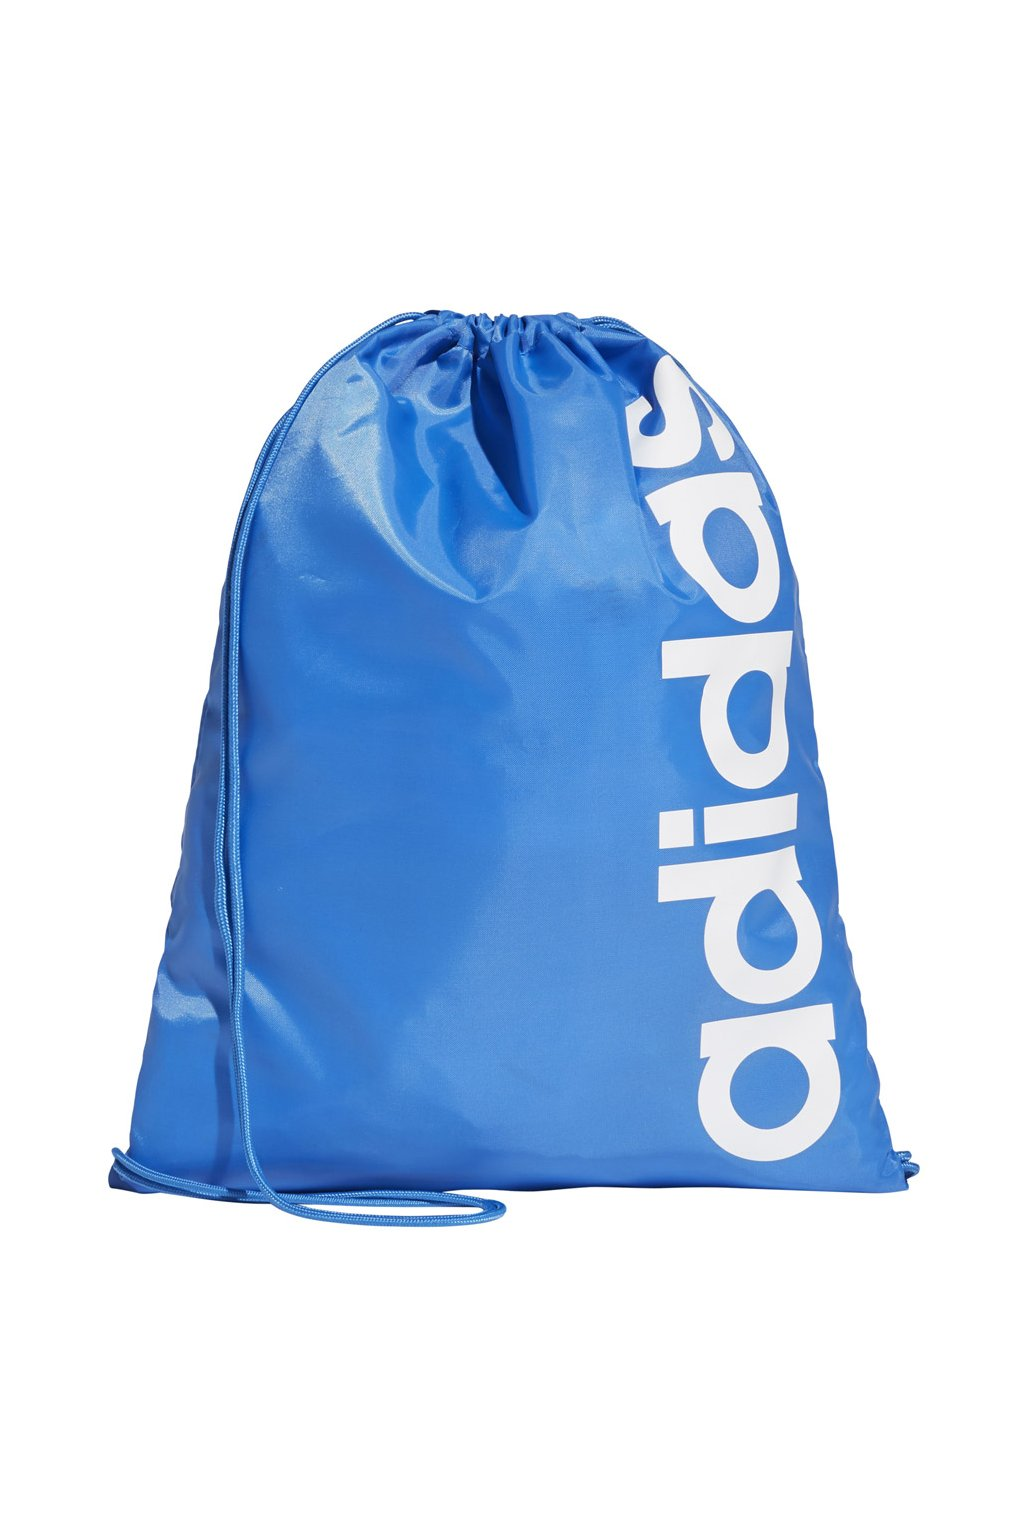 Športový vak Adidas,  modrý DT8625